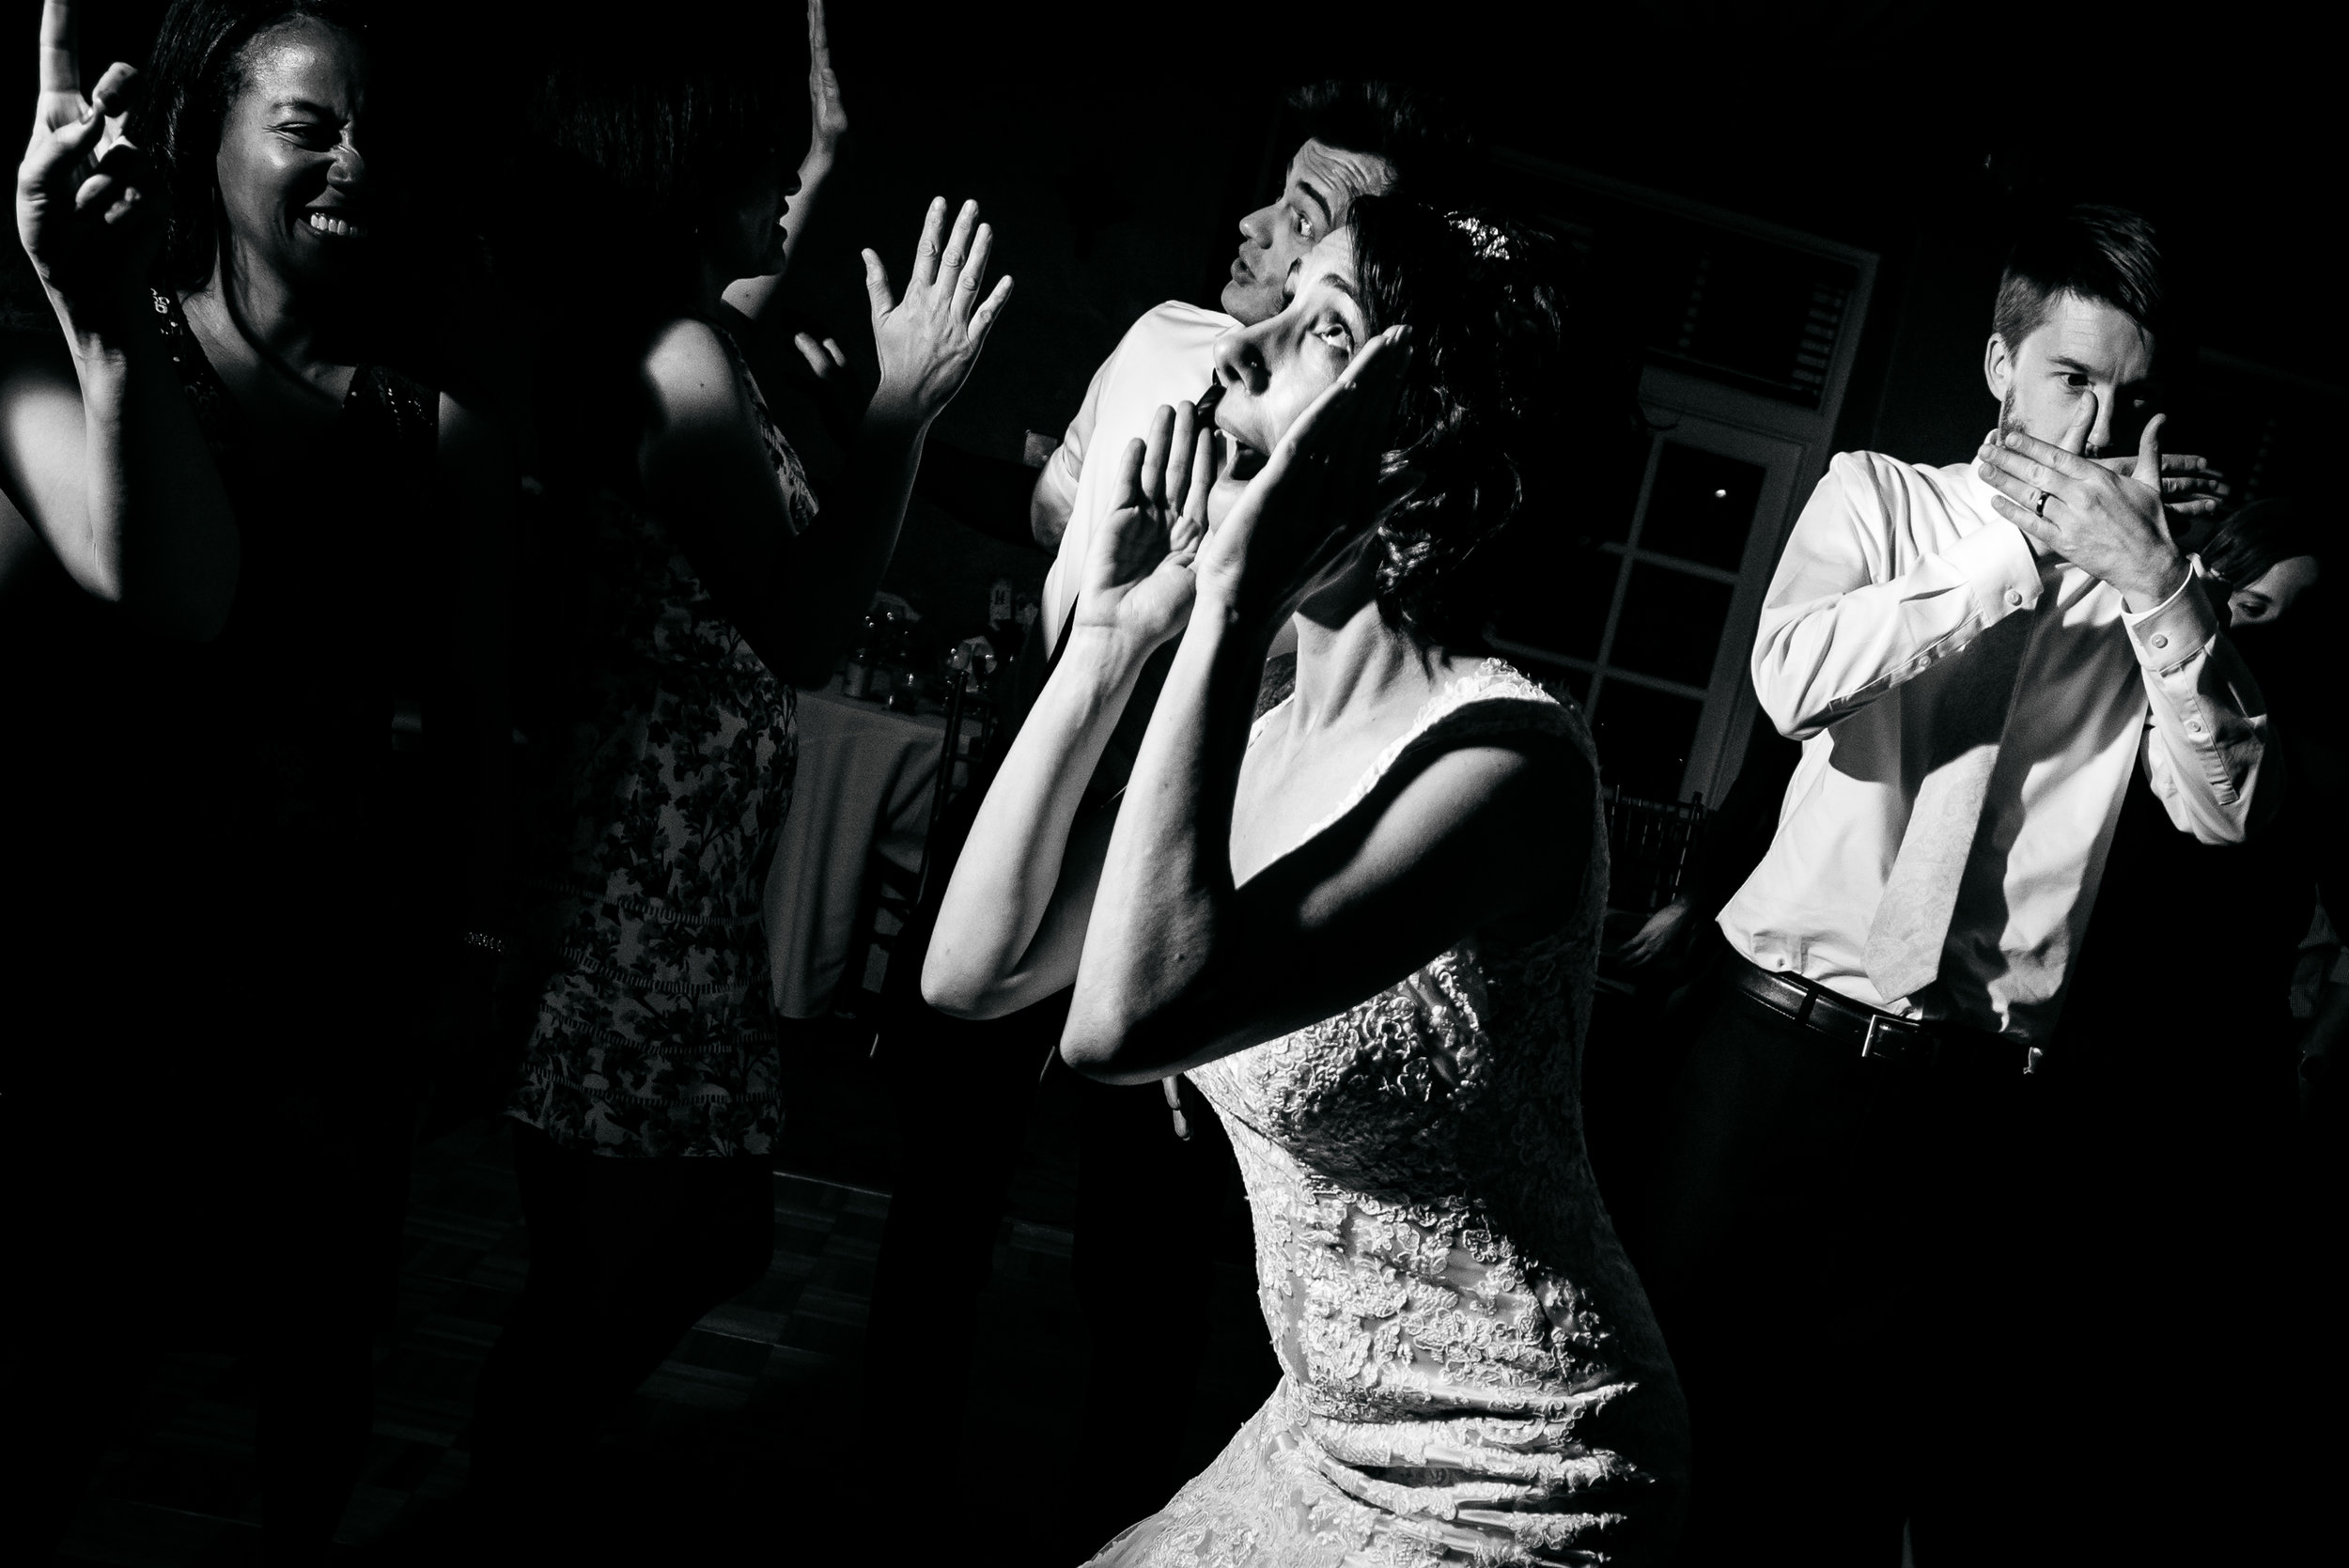 Extended_Play_Photography_Carmella_Wedding-28.jpg